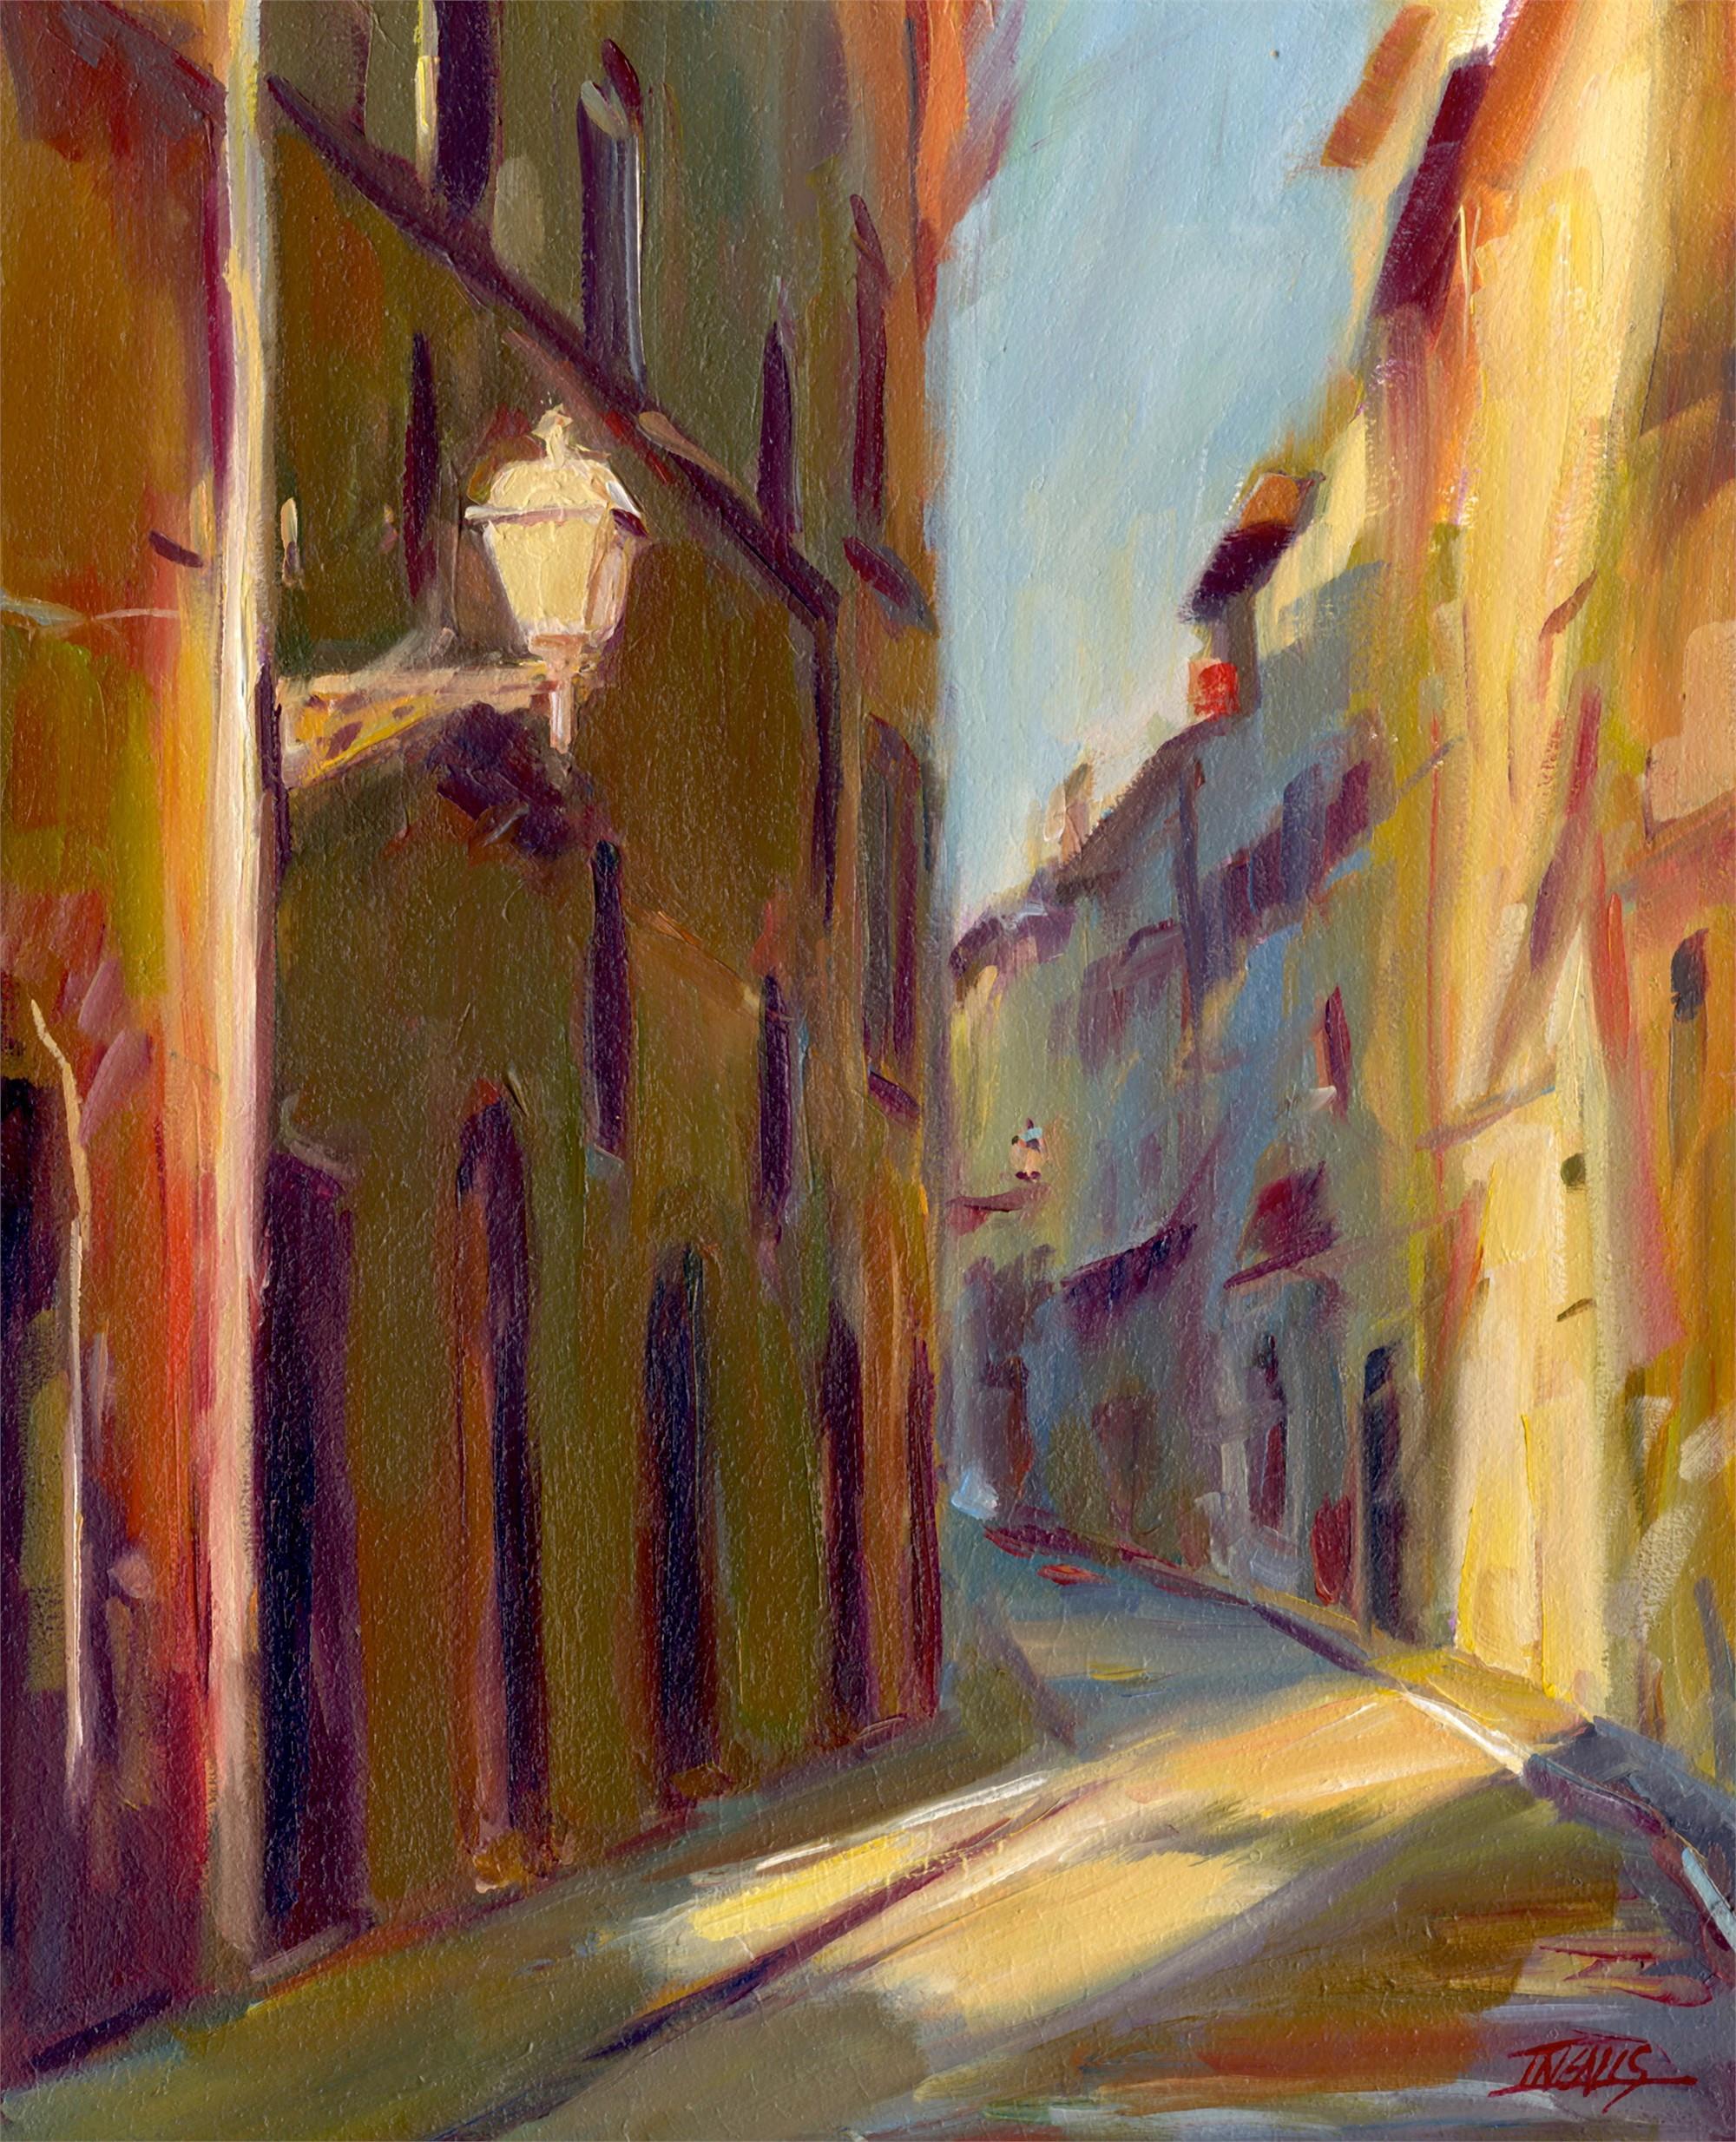 Via San Niccolo by Pam Ingalls